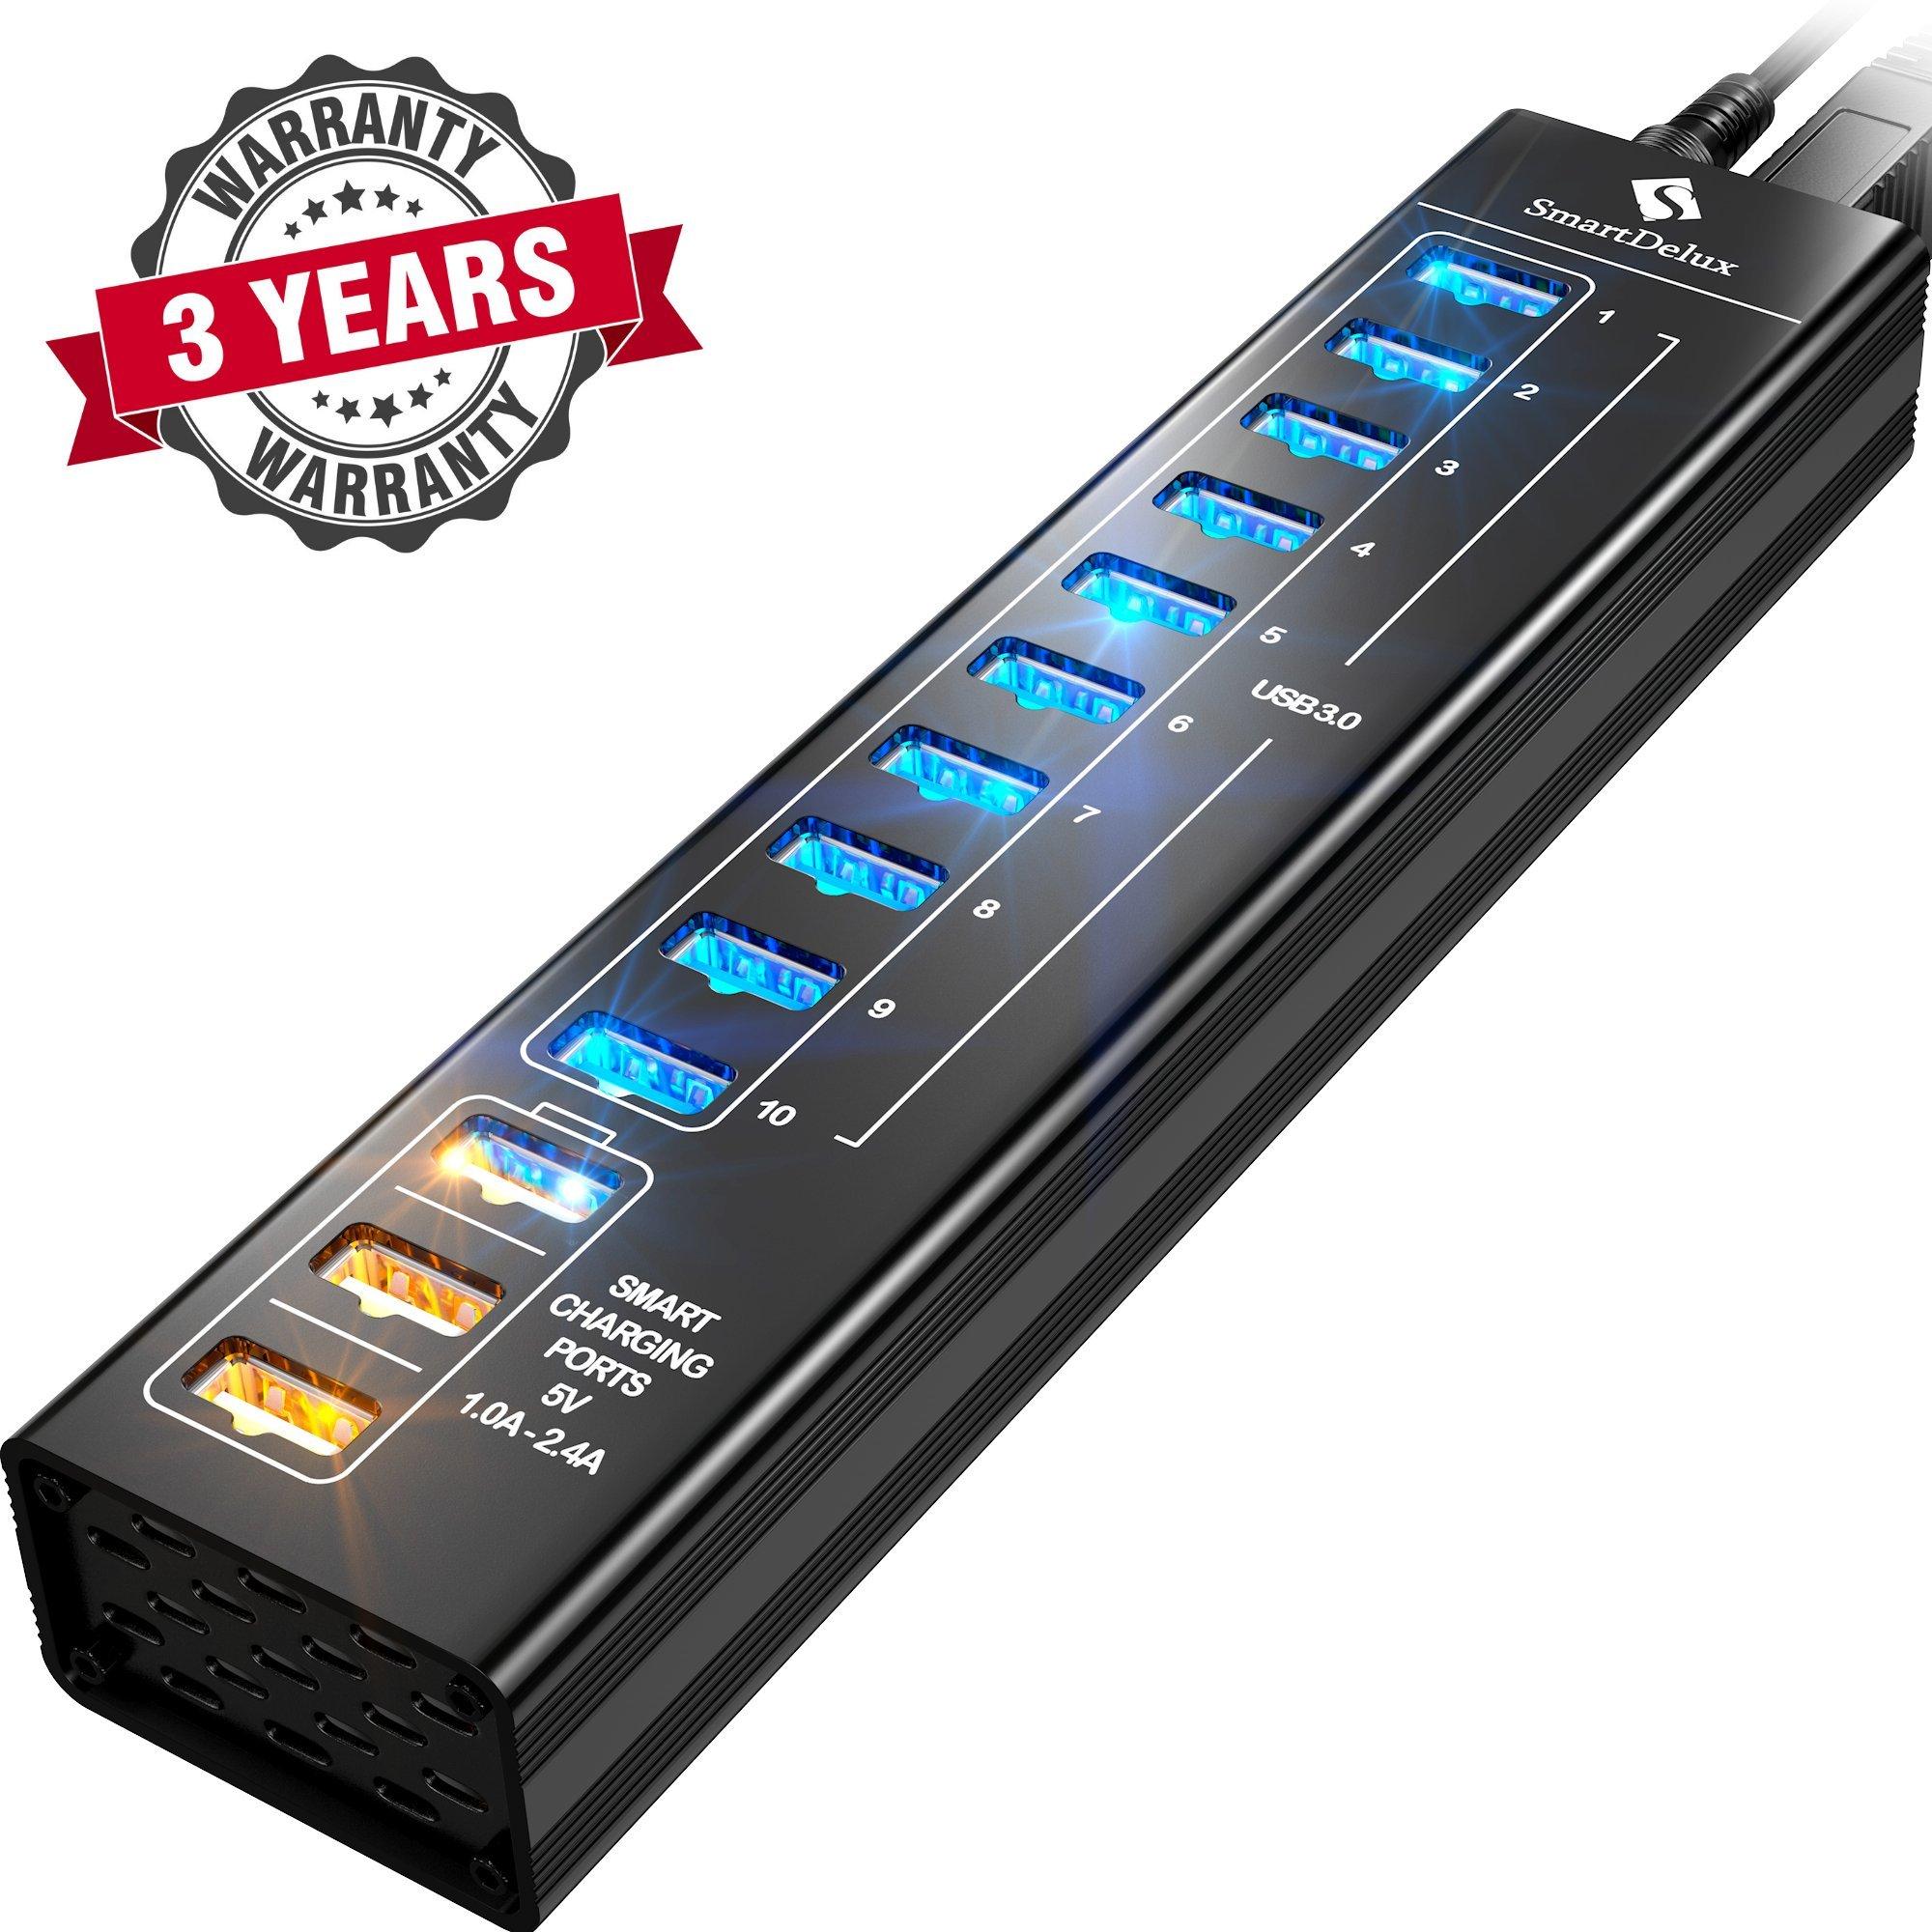 SmartDelux Powered USB Hub - 13-Port USB 3.0 Hub 10 USB 3.0 Ports, 3 Smart Charging Ports, Power Adapter, Long Cord, LEDs - Black Aluminum